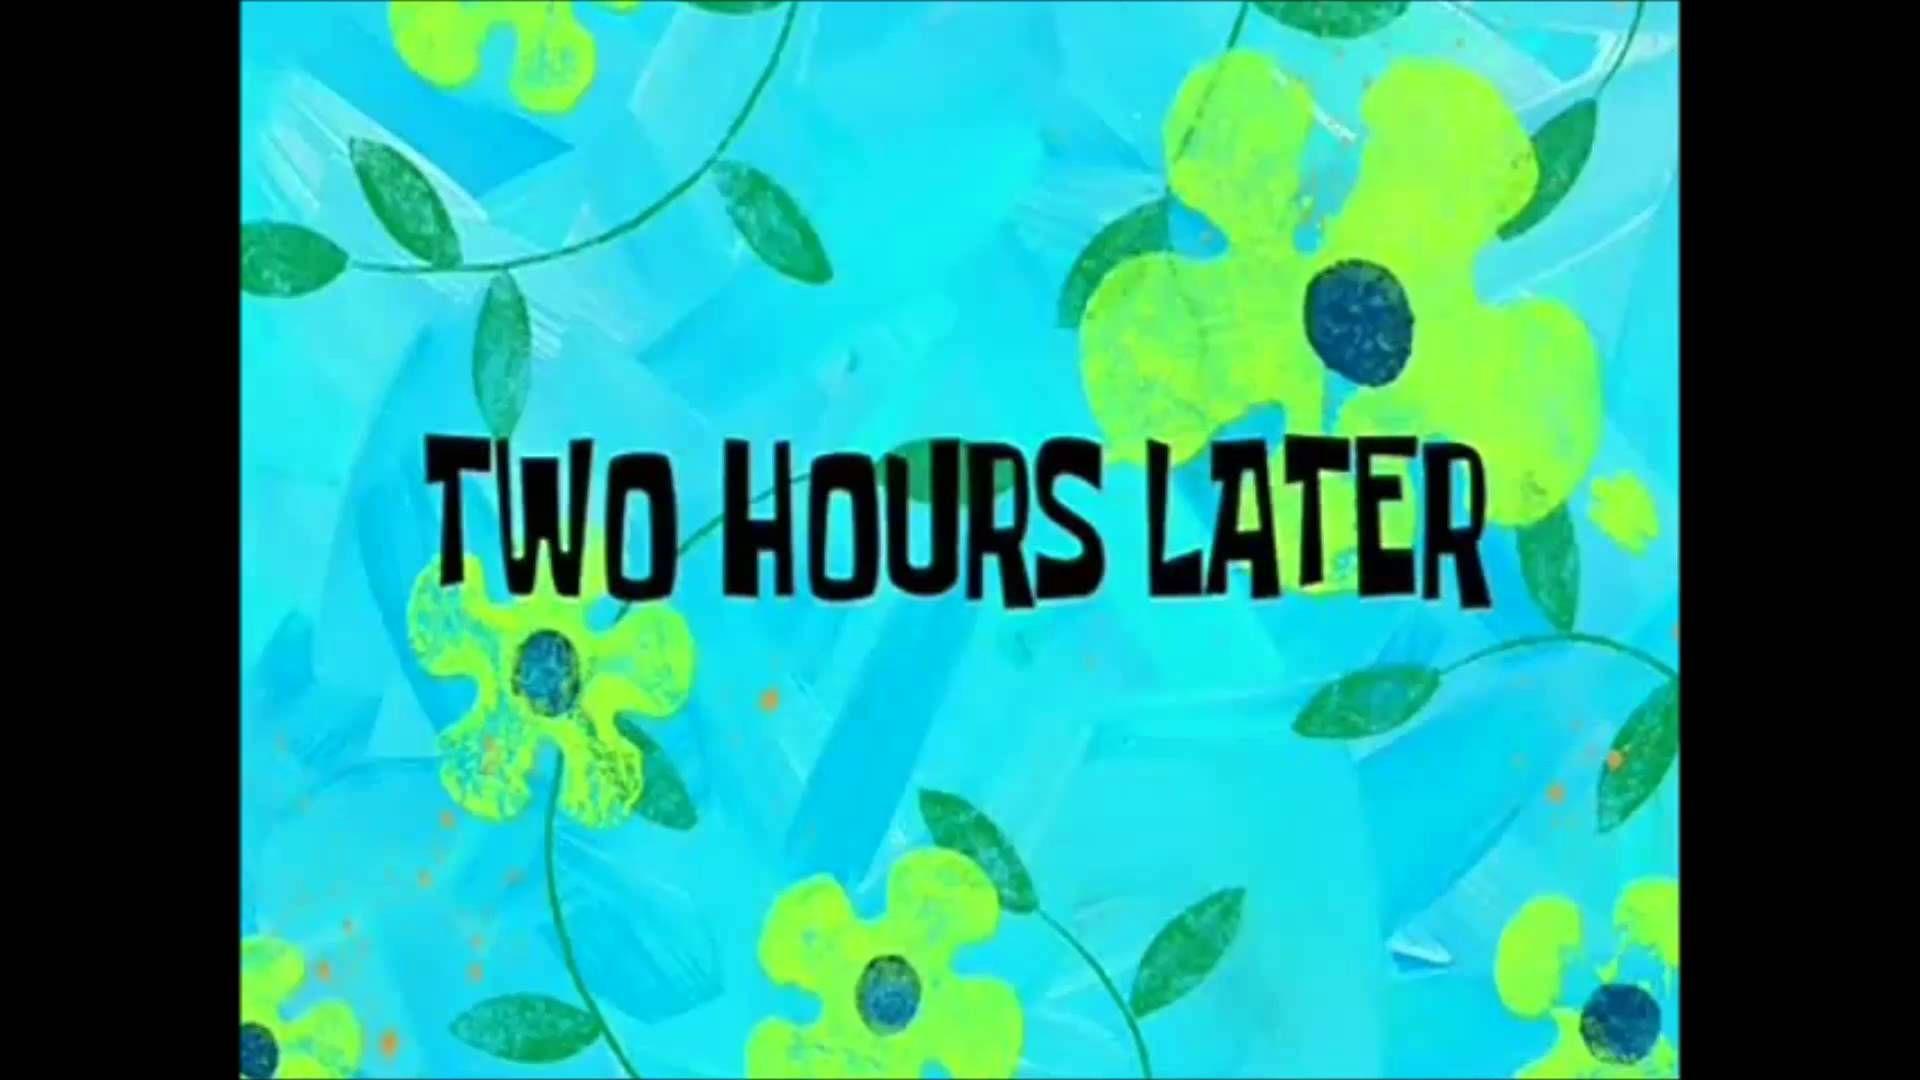 Spongebob 2 hours later youtube